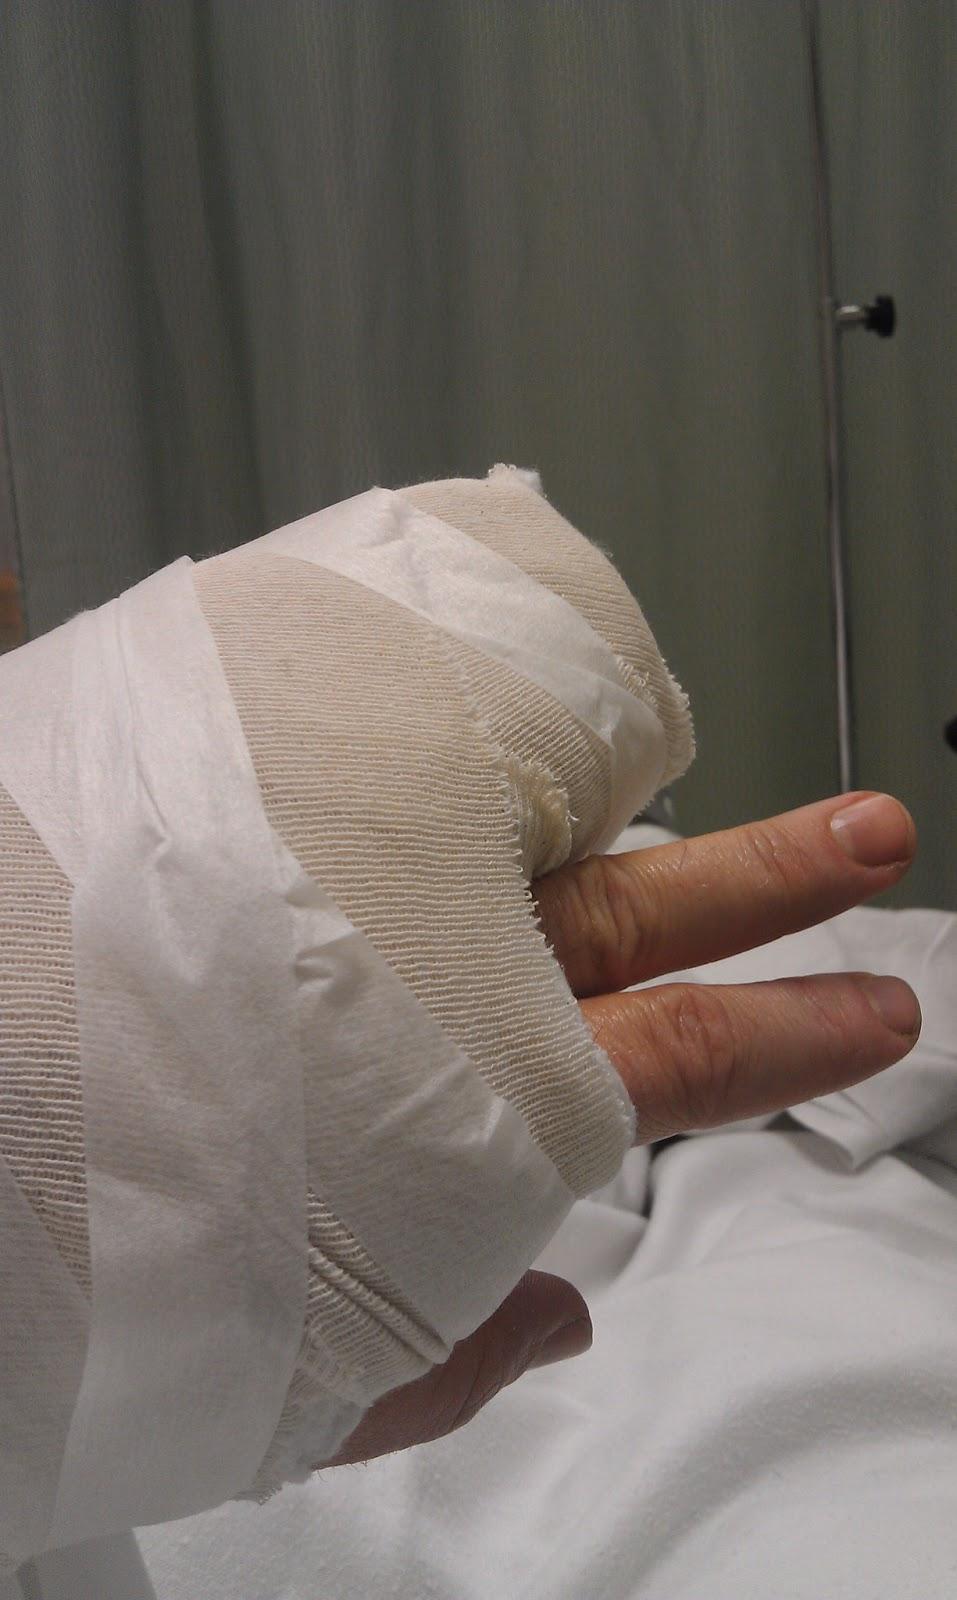 Bandaged+hand.jpg